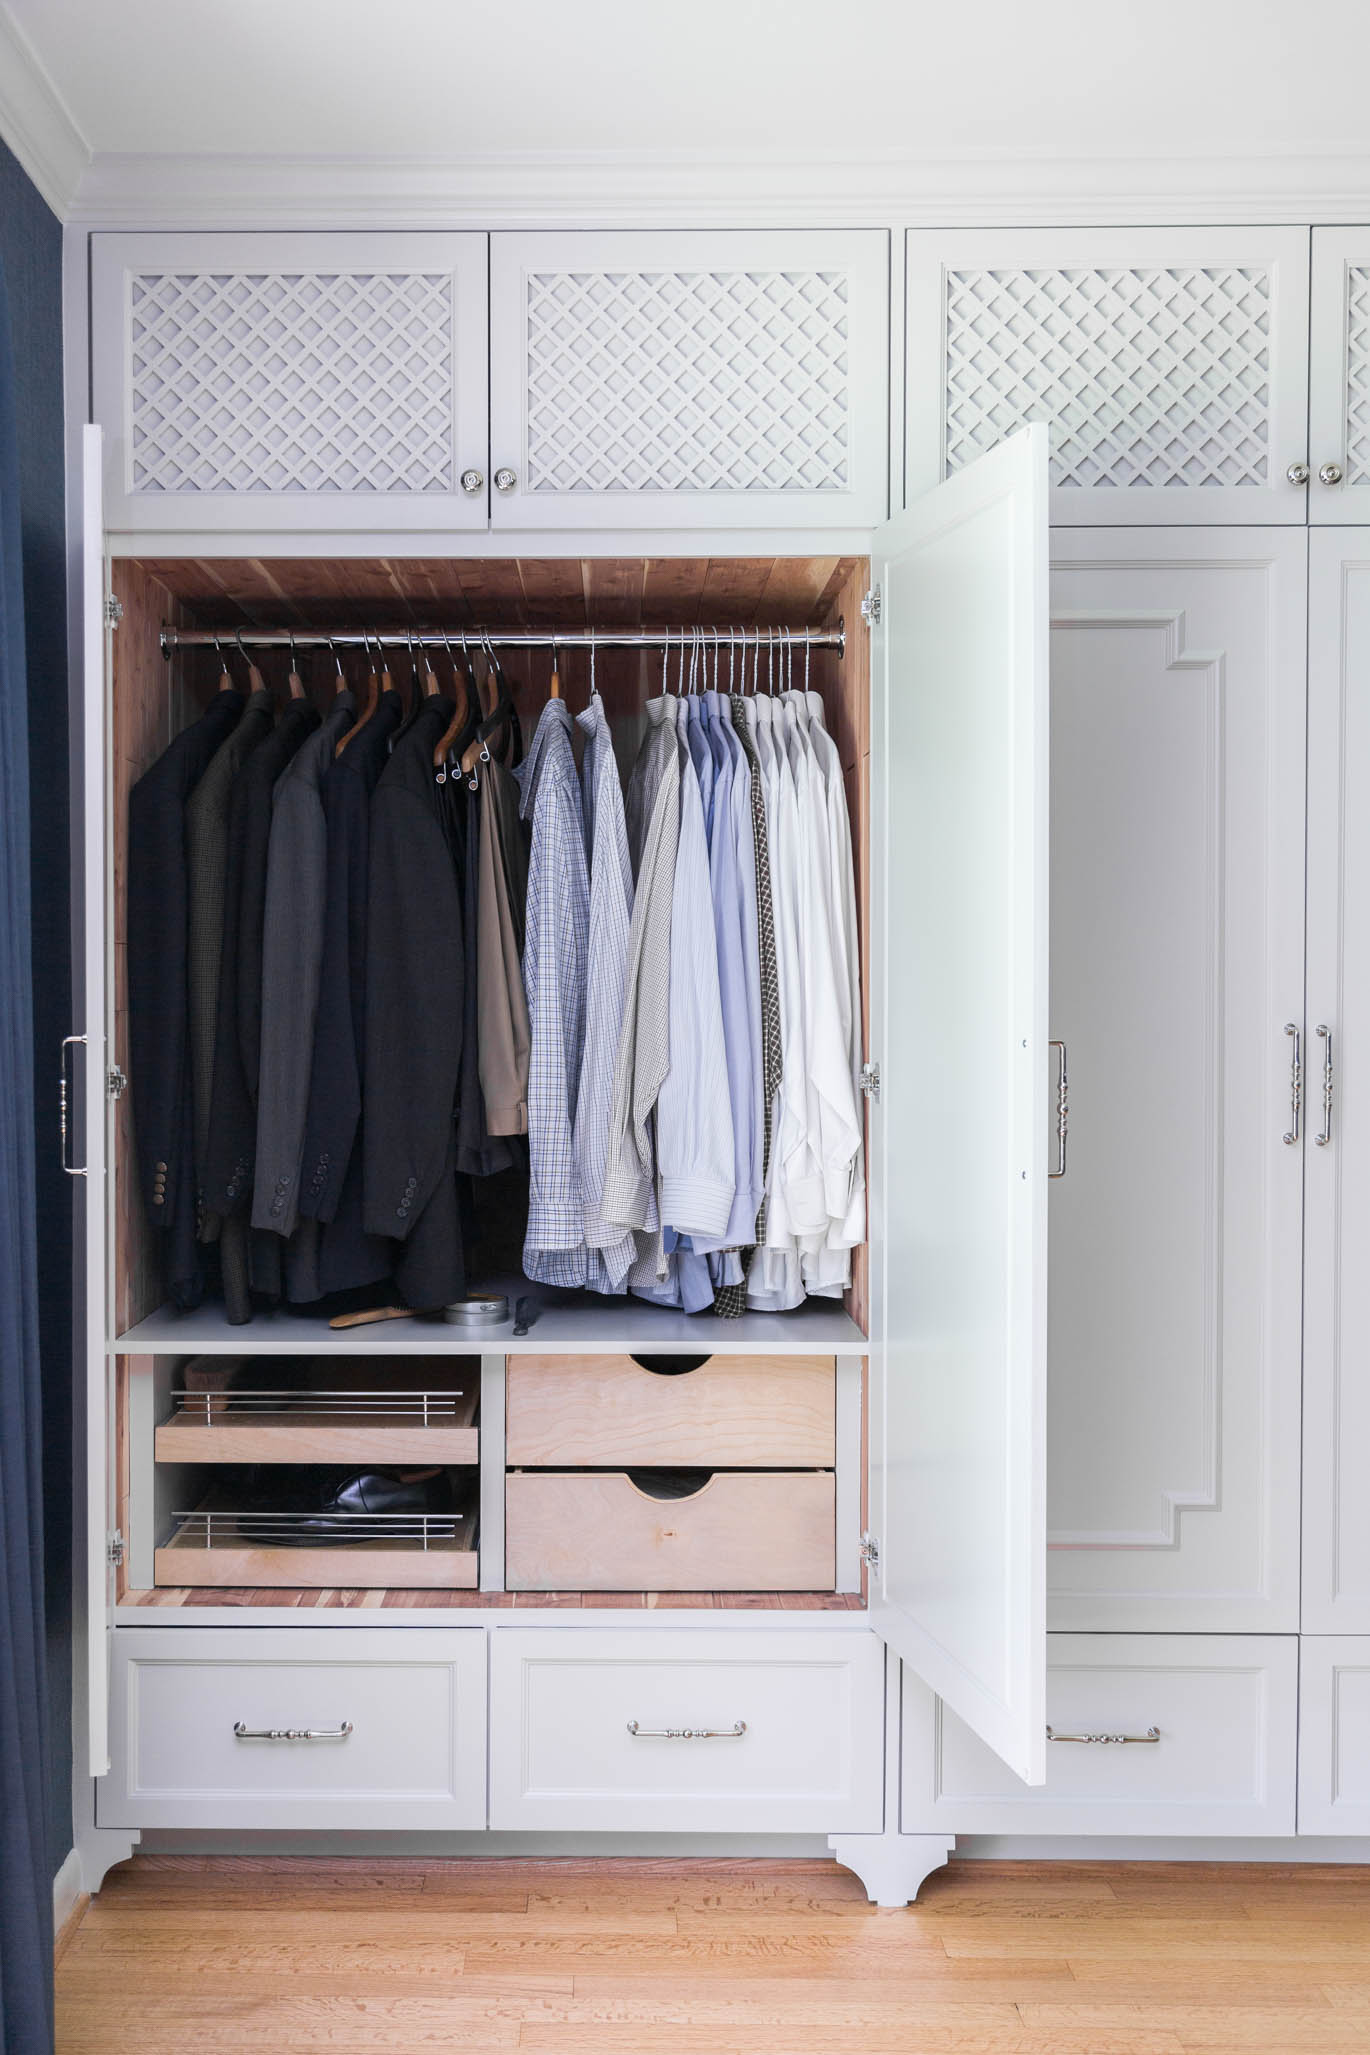 Master bedroom closet in cabinetry  Designer-Carla Aston, Photographer- Tori Aston #wardrobecloset #customcabinetry #closet